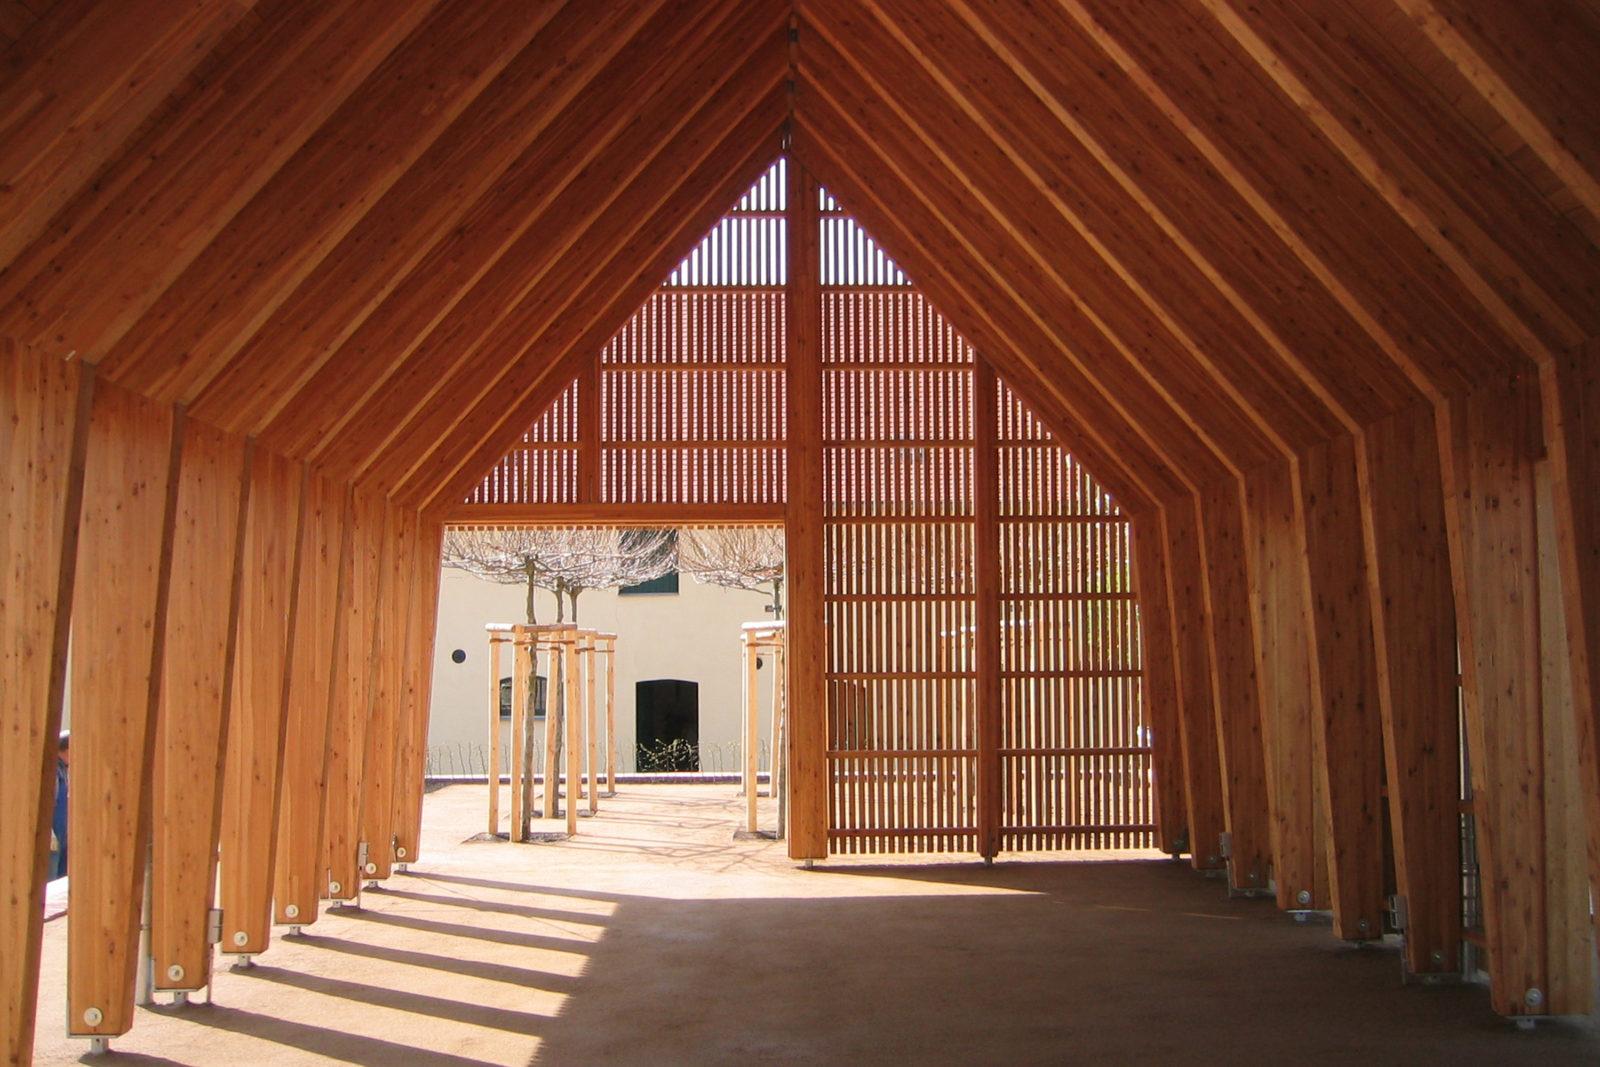 Pavillon im Park Canitz - Innenraum